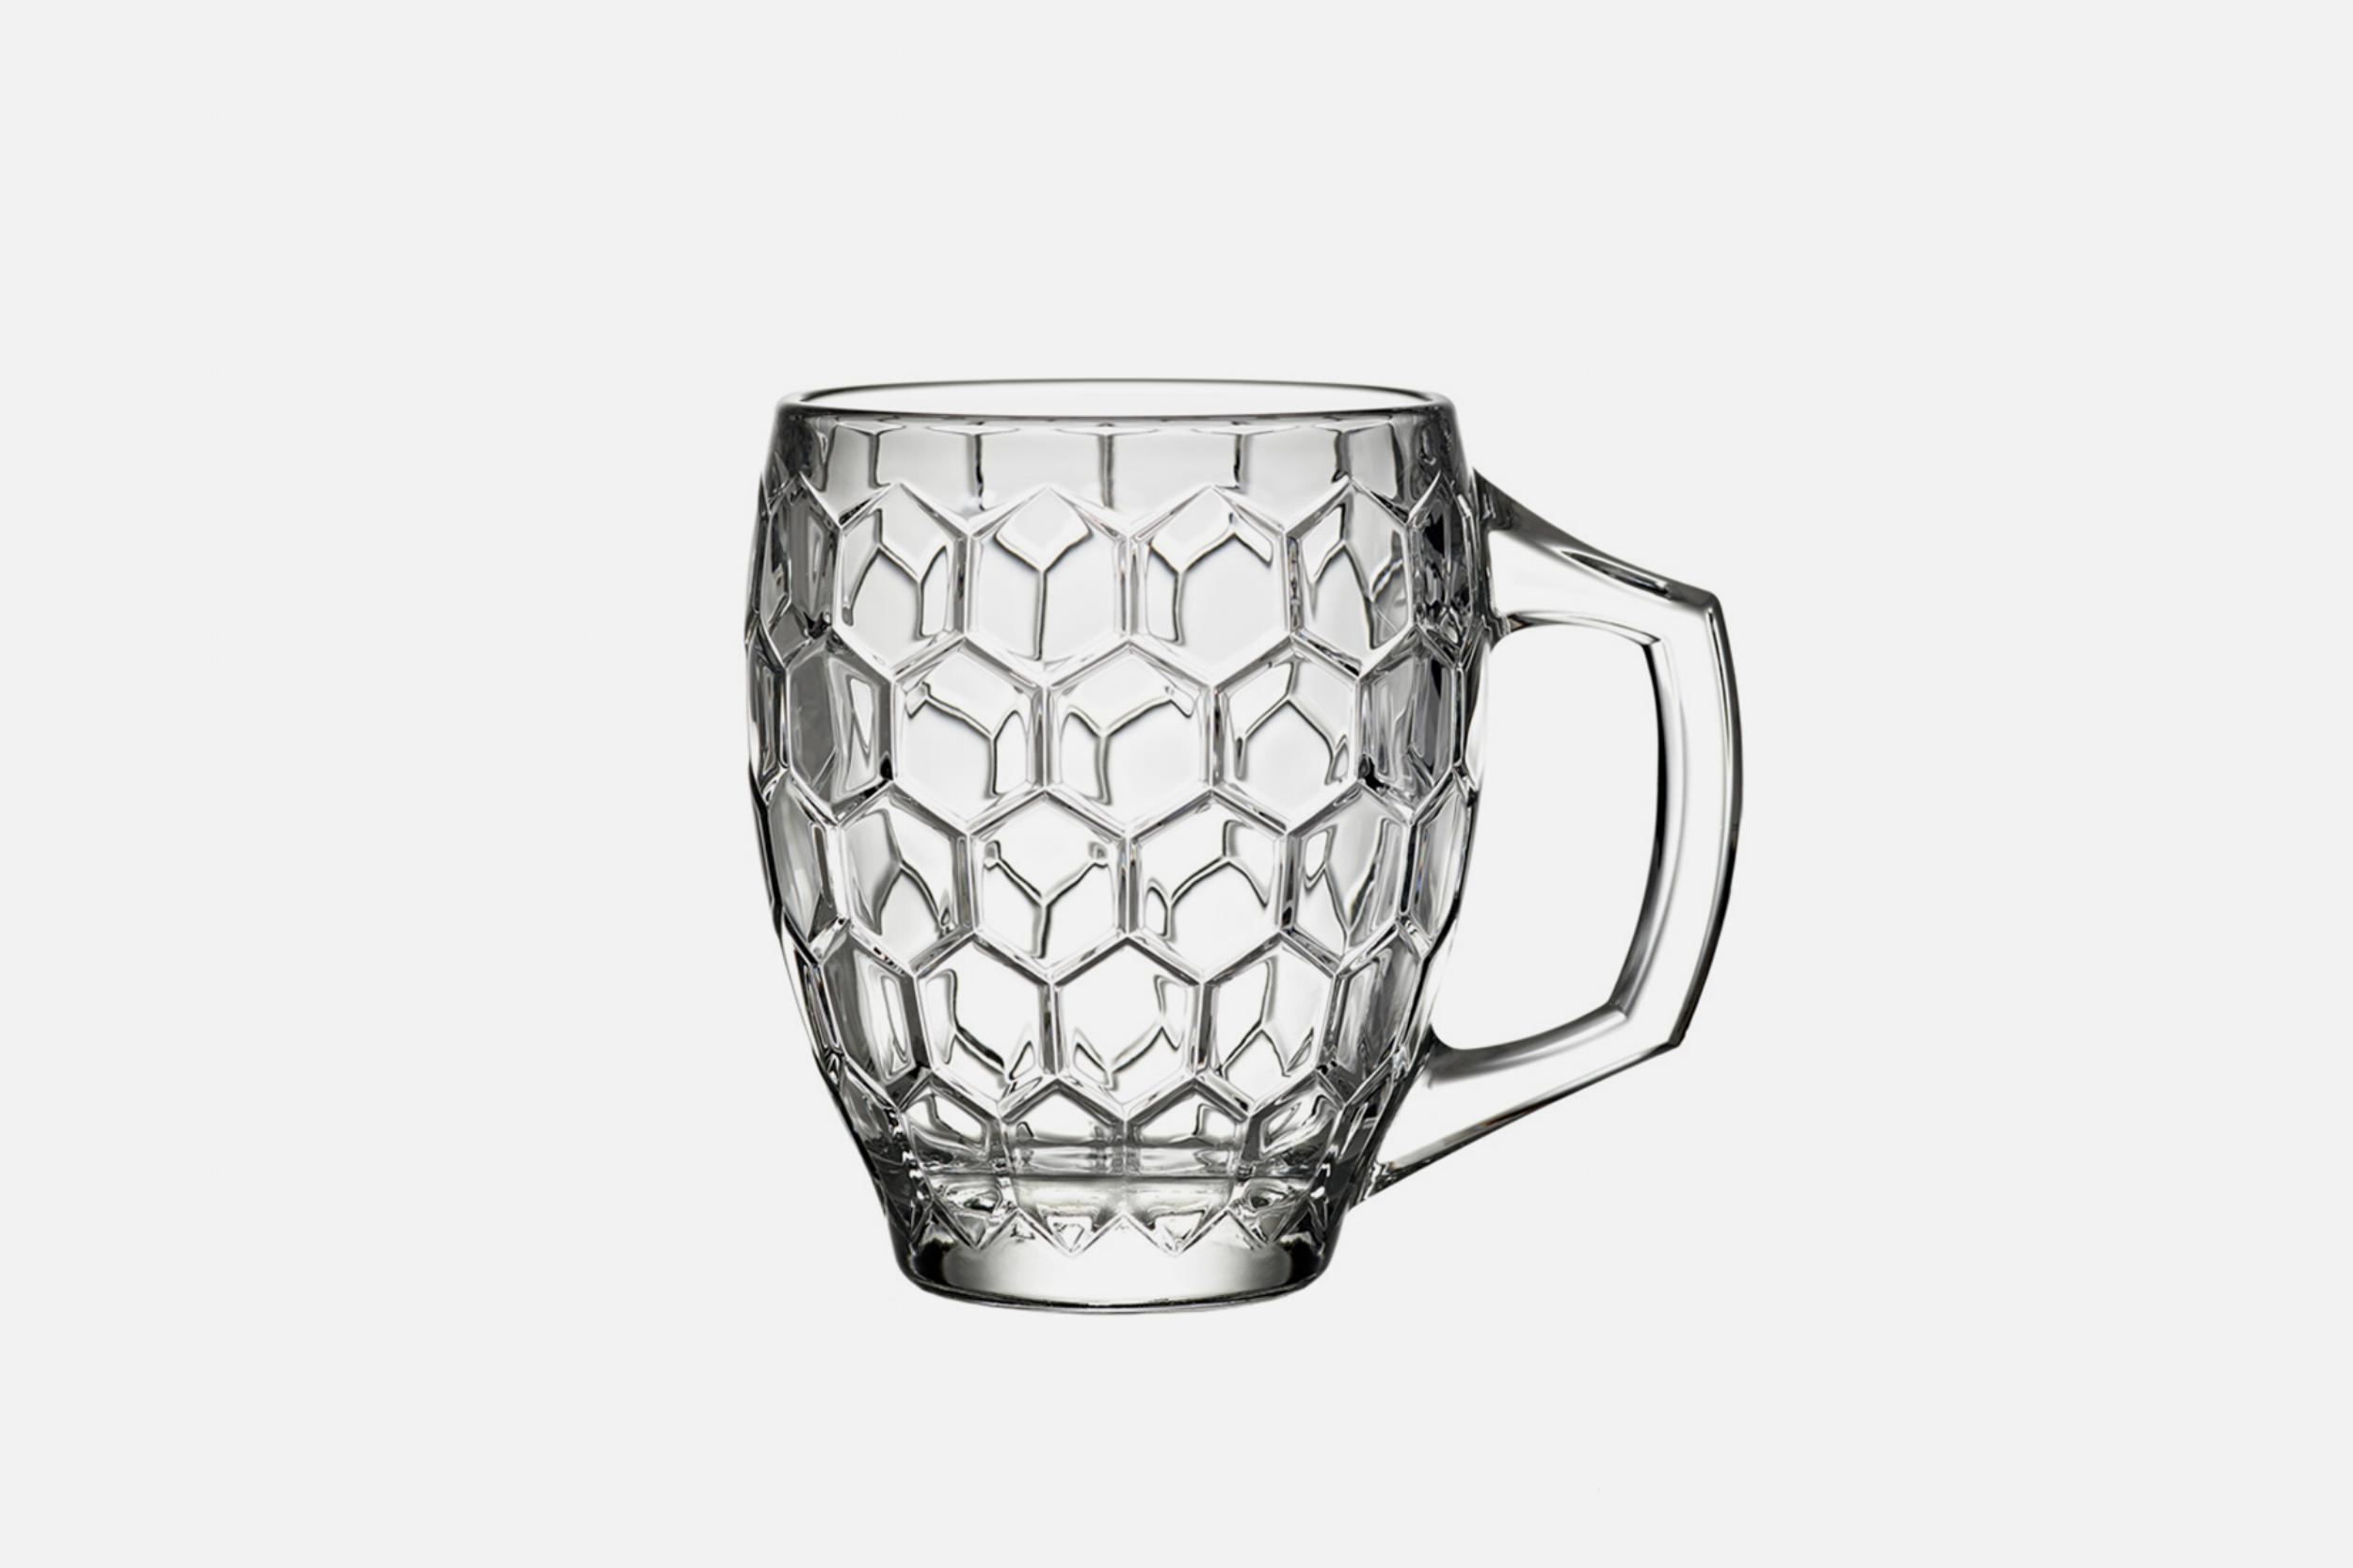 Beer mug - 2 pcs, 40 clGlassDesign by H O W, Magnus JørgensenArt. no.: 55220